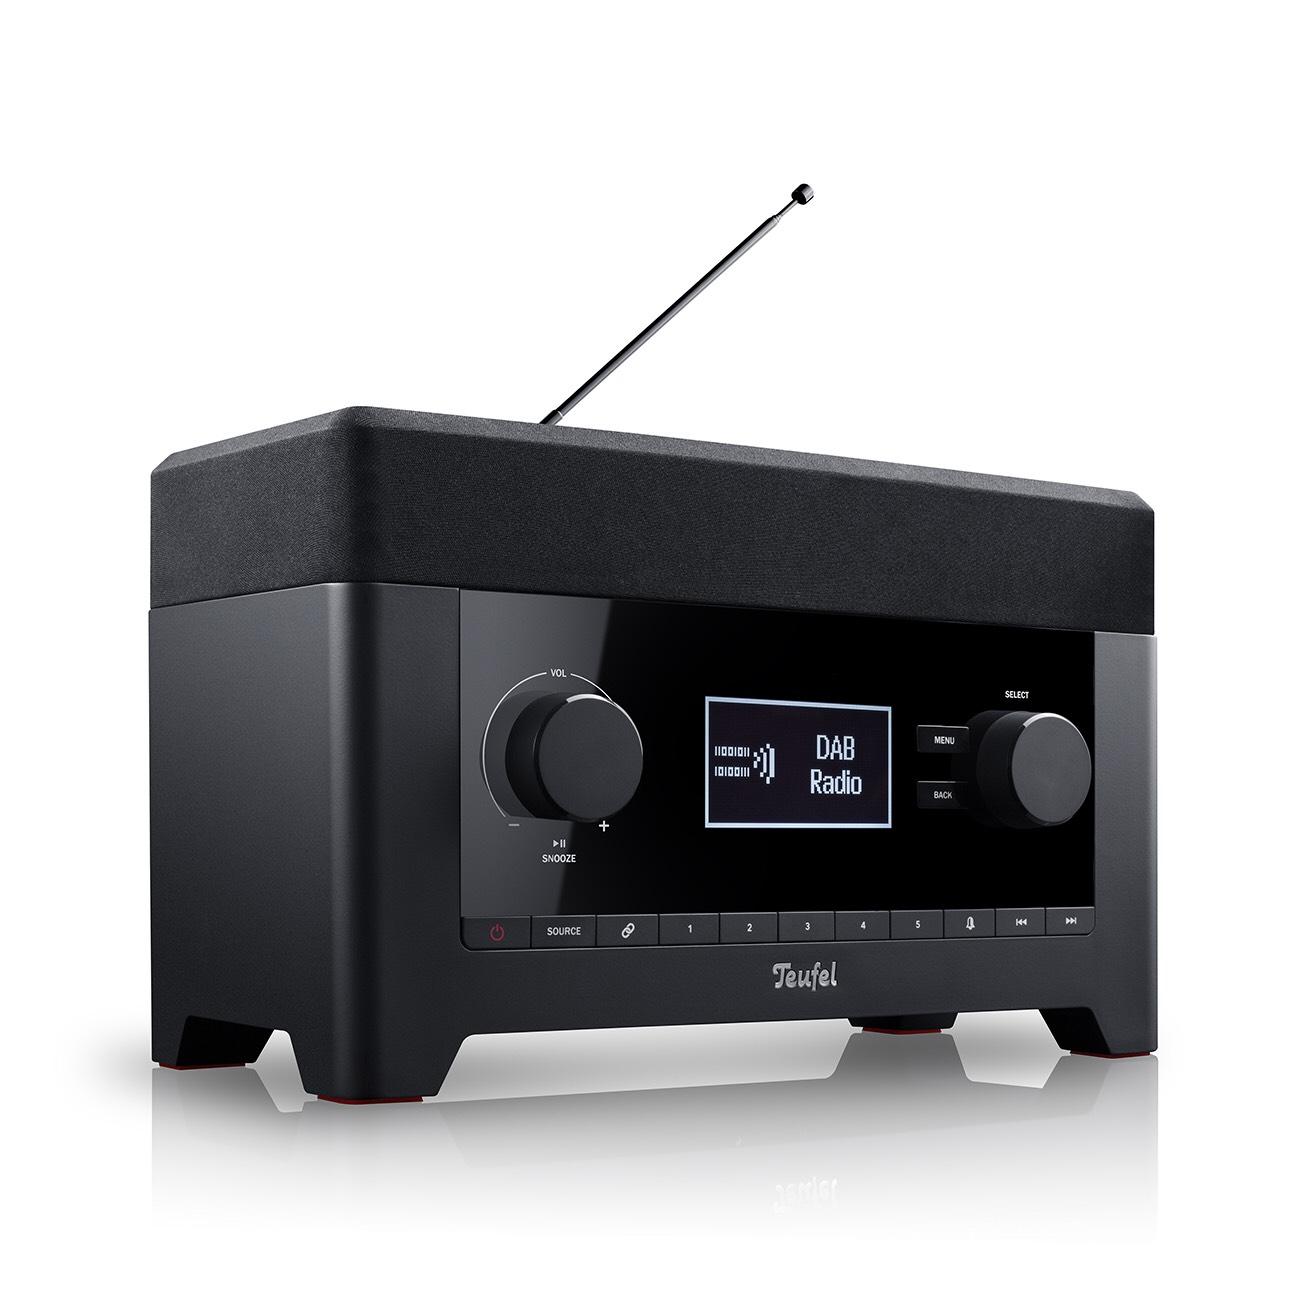 Teufel 3 sixty Digitalradio 225,98 Euro incl. Versand